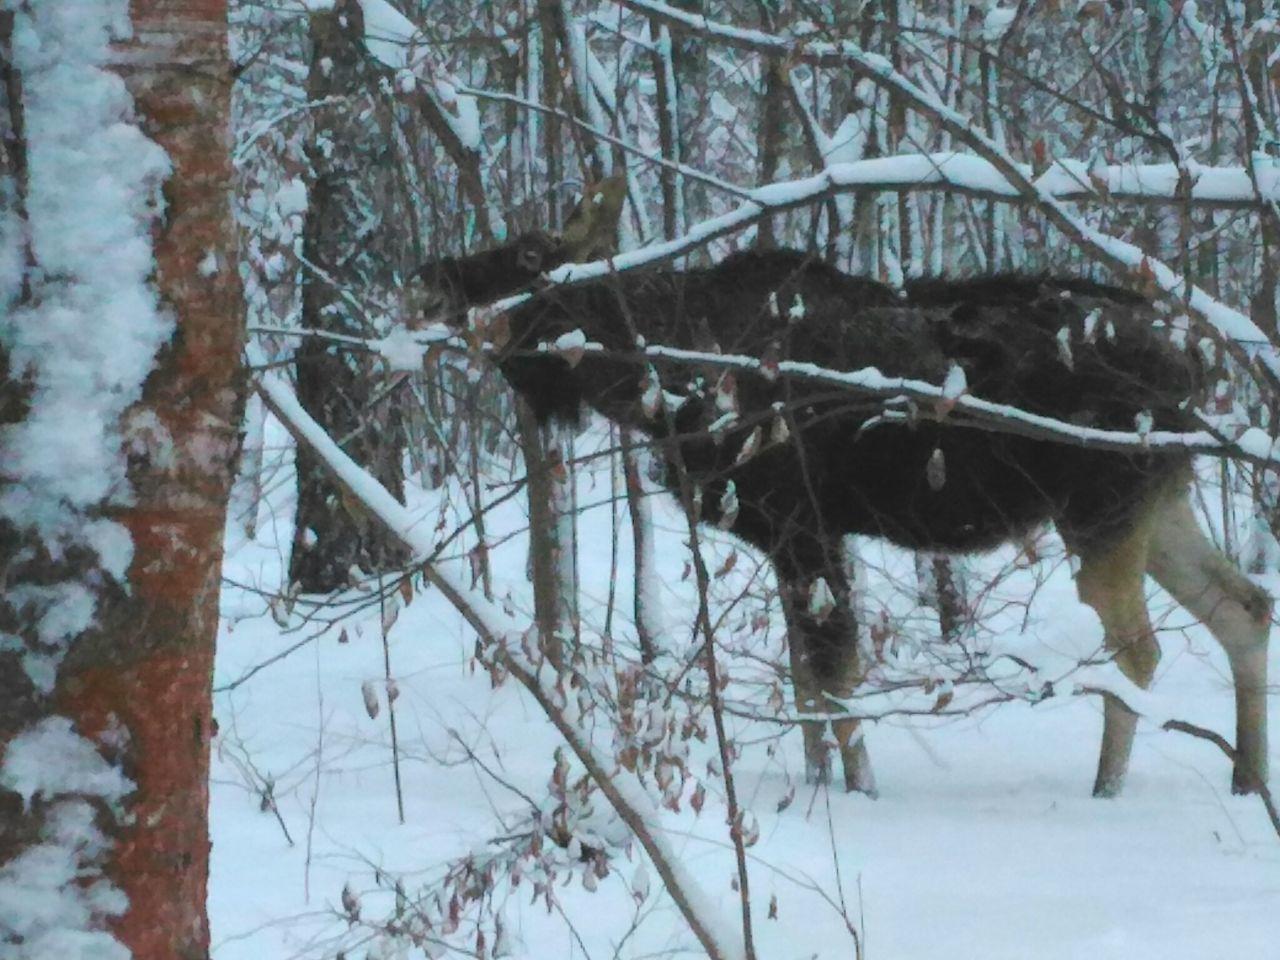 Elk Nature Winter Moscow Russia Nationalpark Eyewitness лось природароссии Москва зима❄️